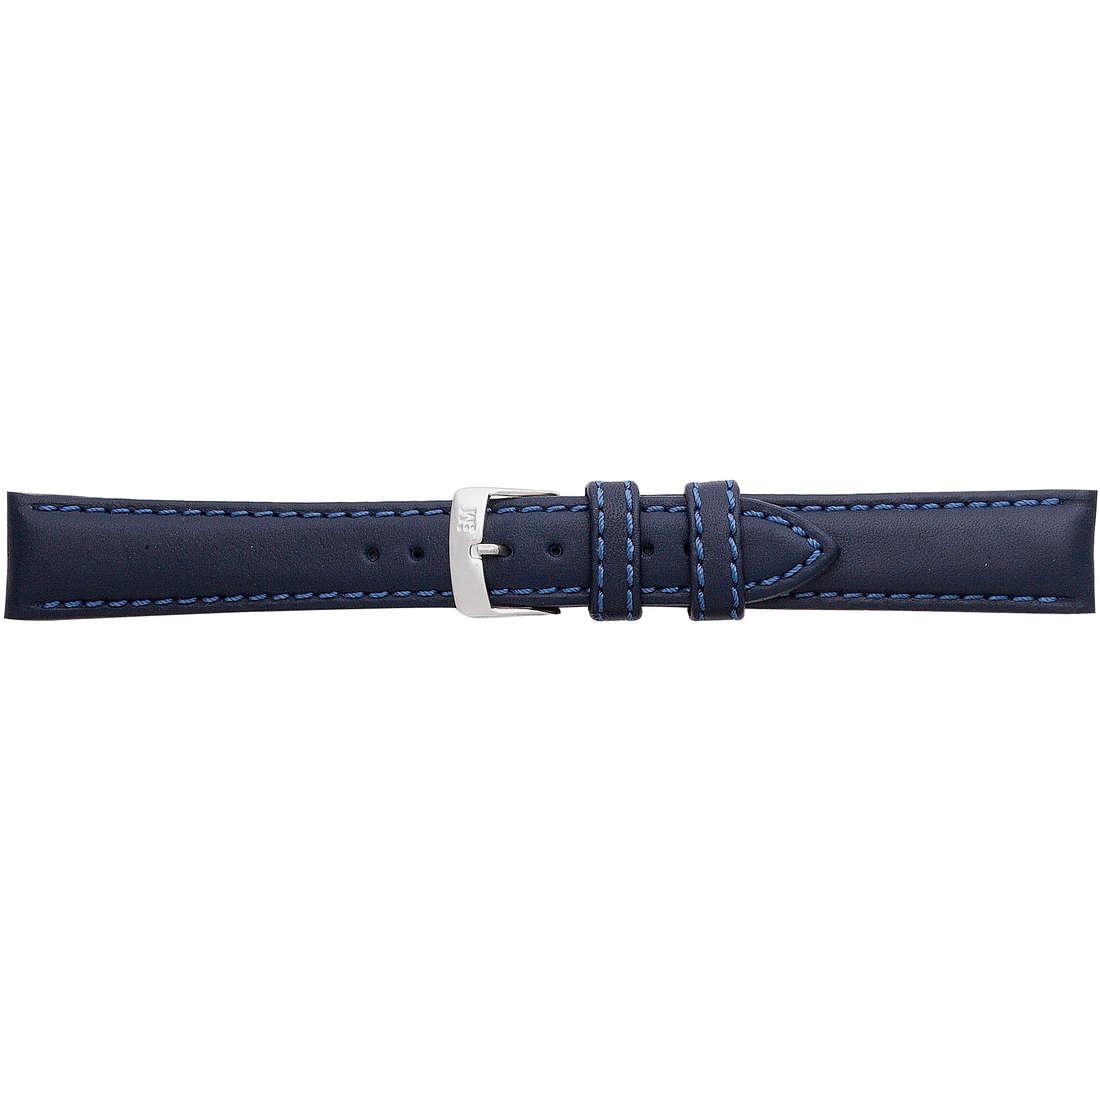 watch watch bands watch straps man Morellato Linea Sport A01X2785237062CR16